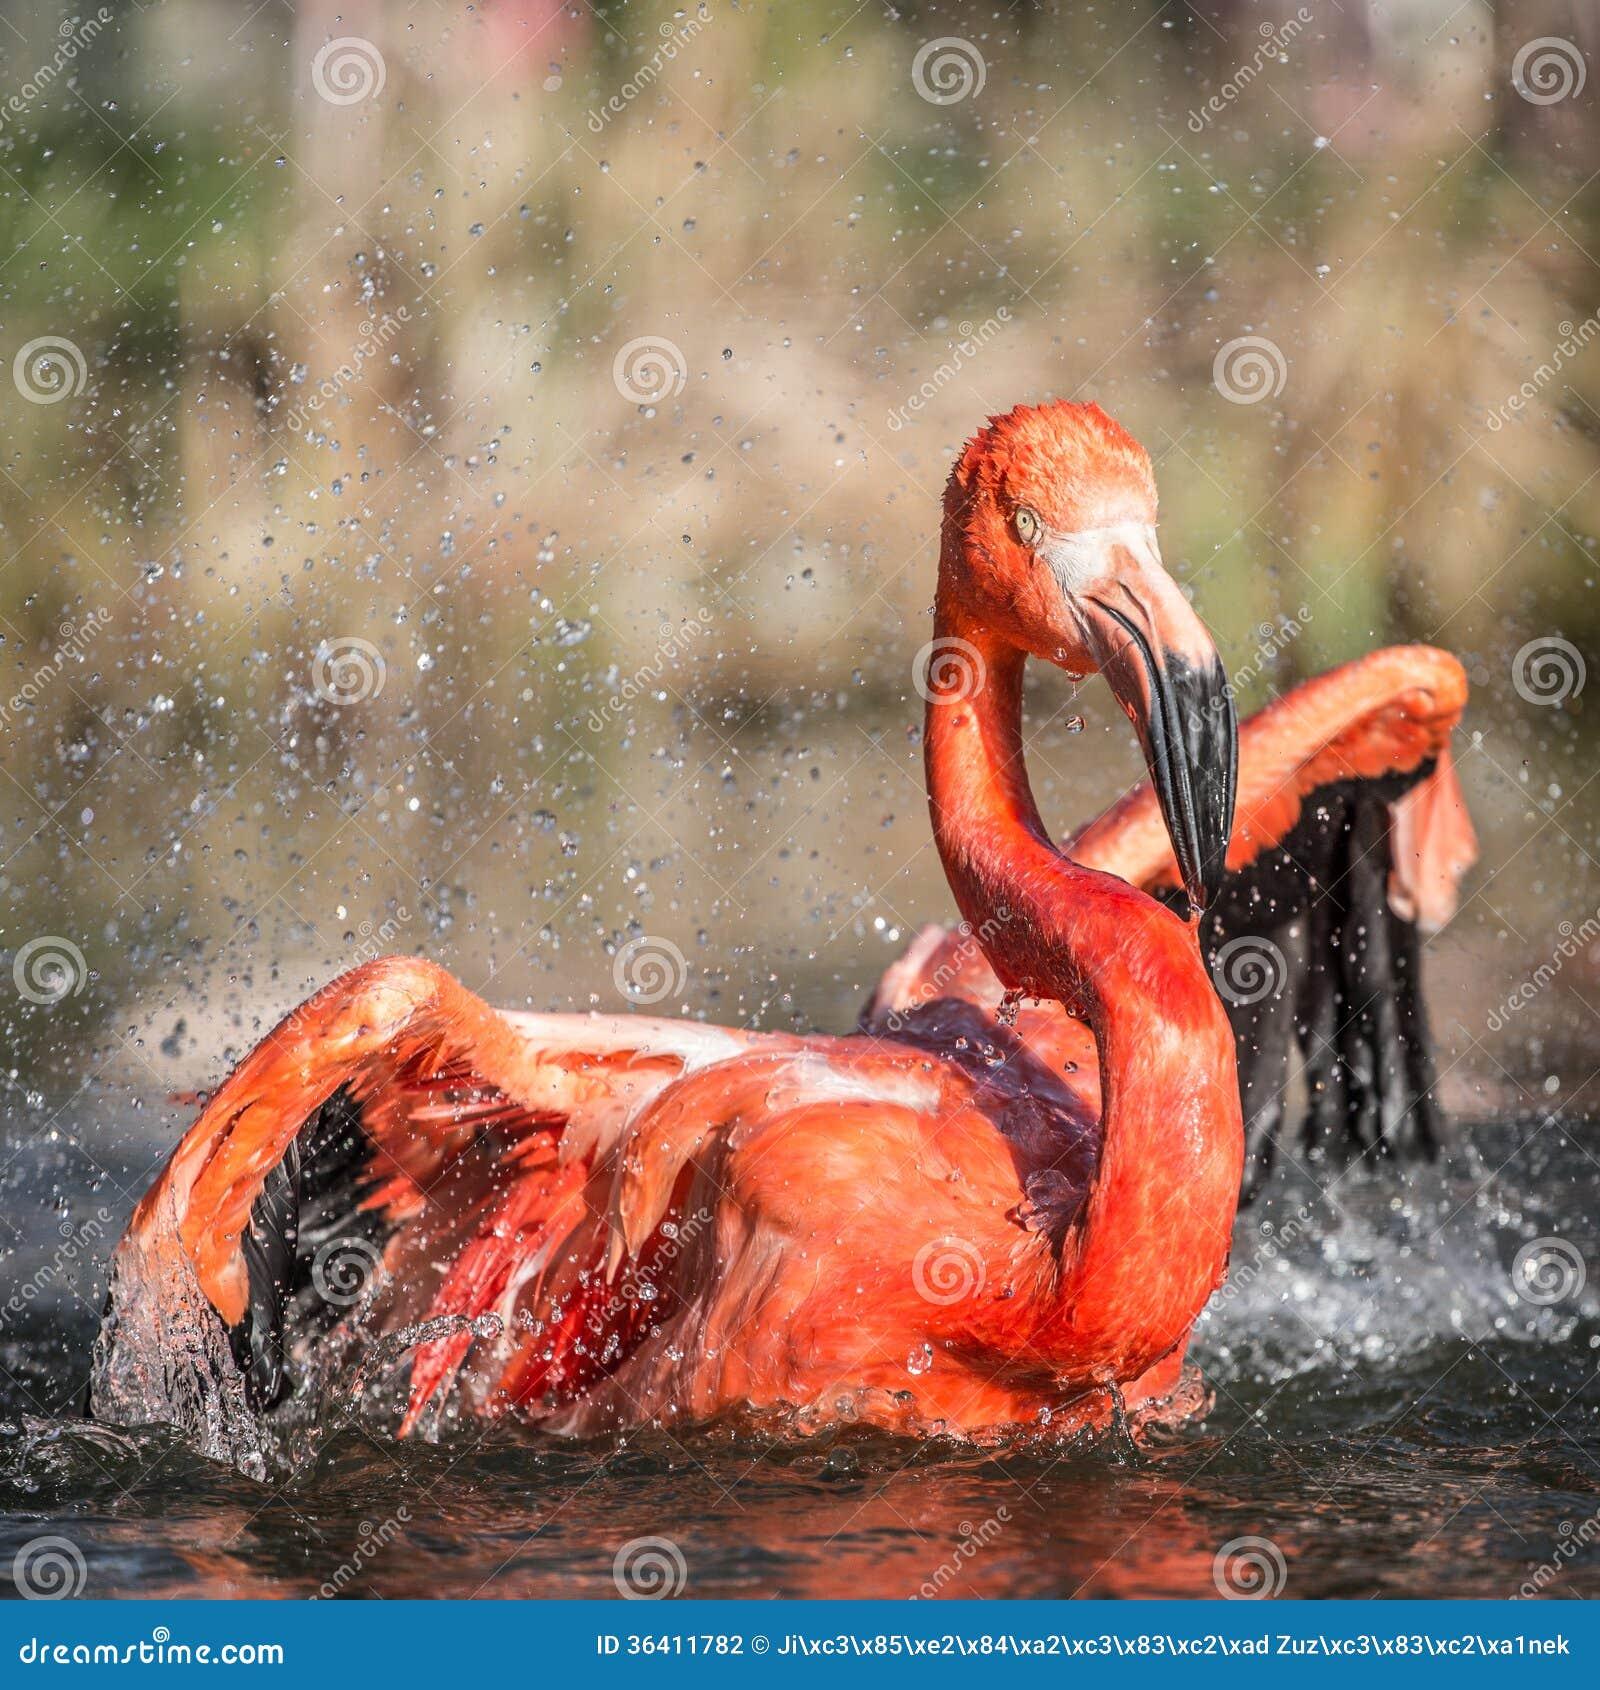 Flamingo portraits